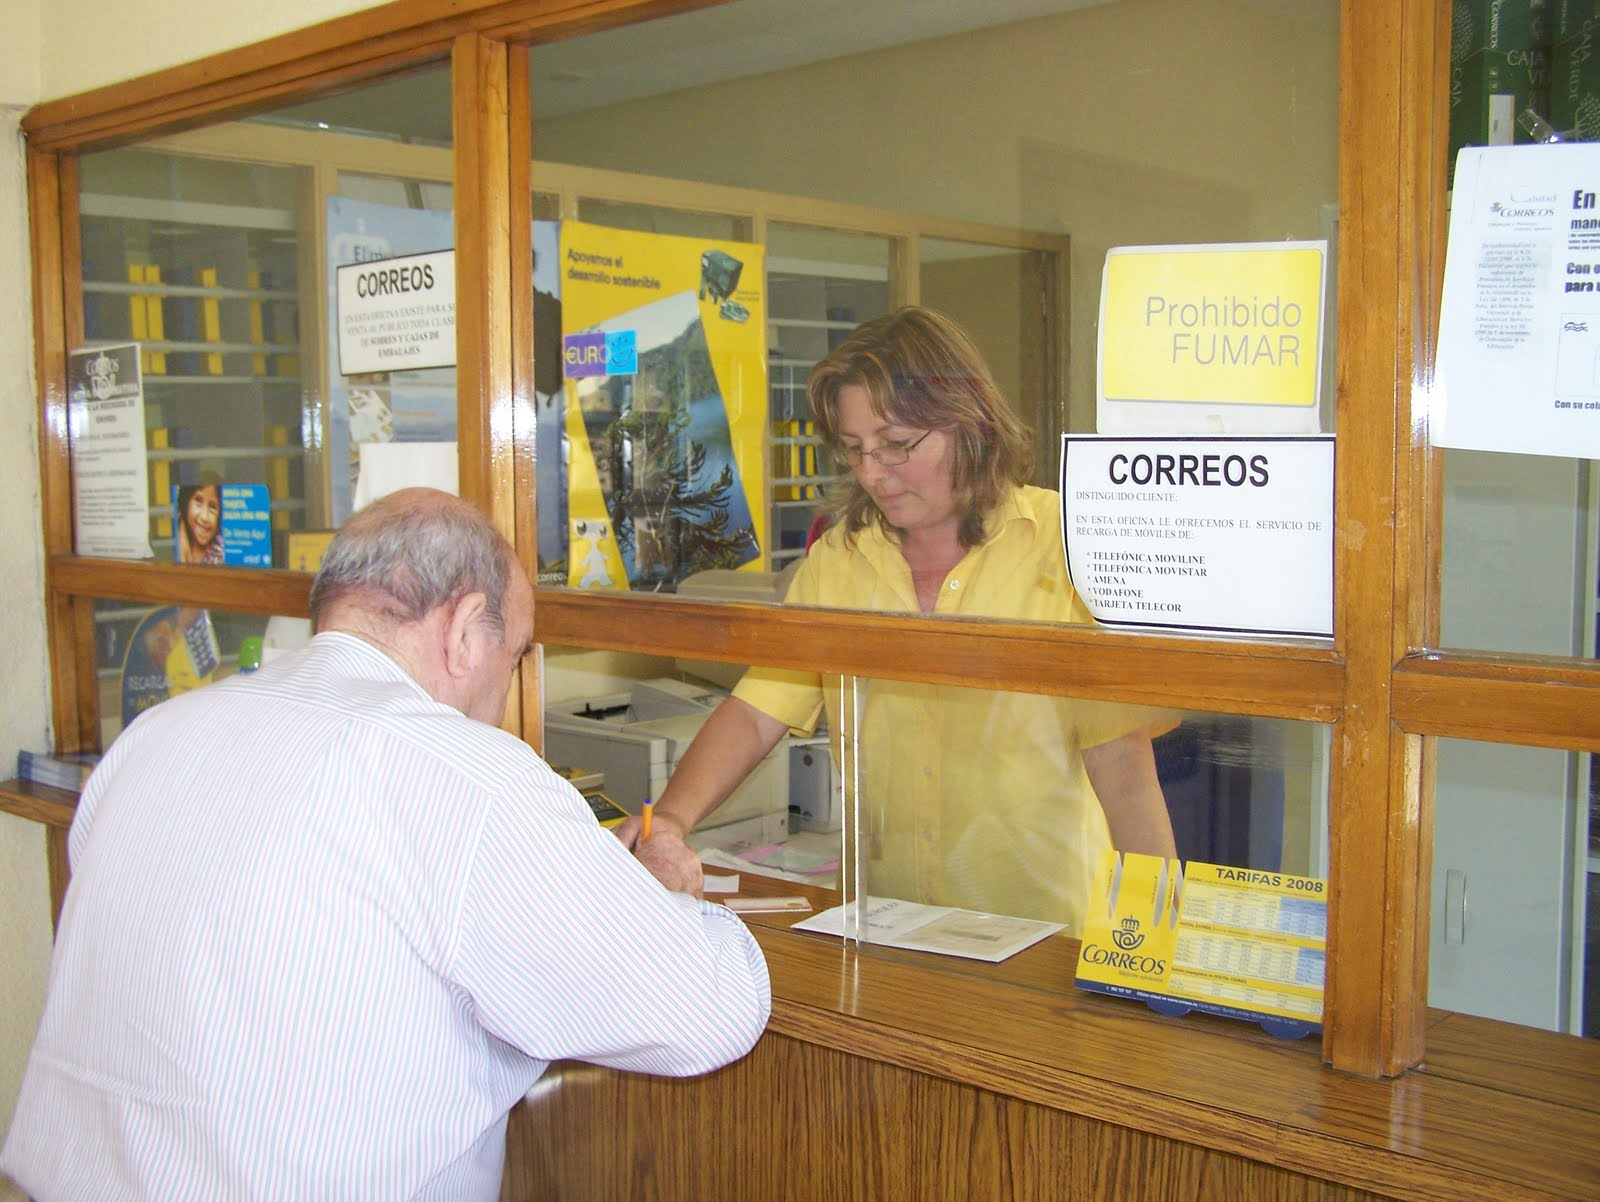 Oficina correos pedro abad for Oficina correos mostoles